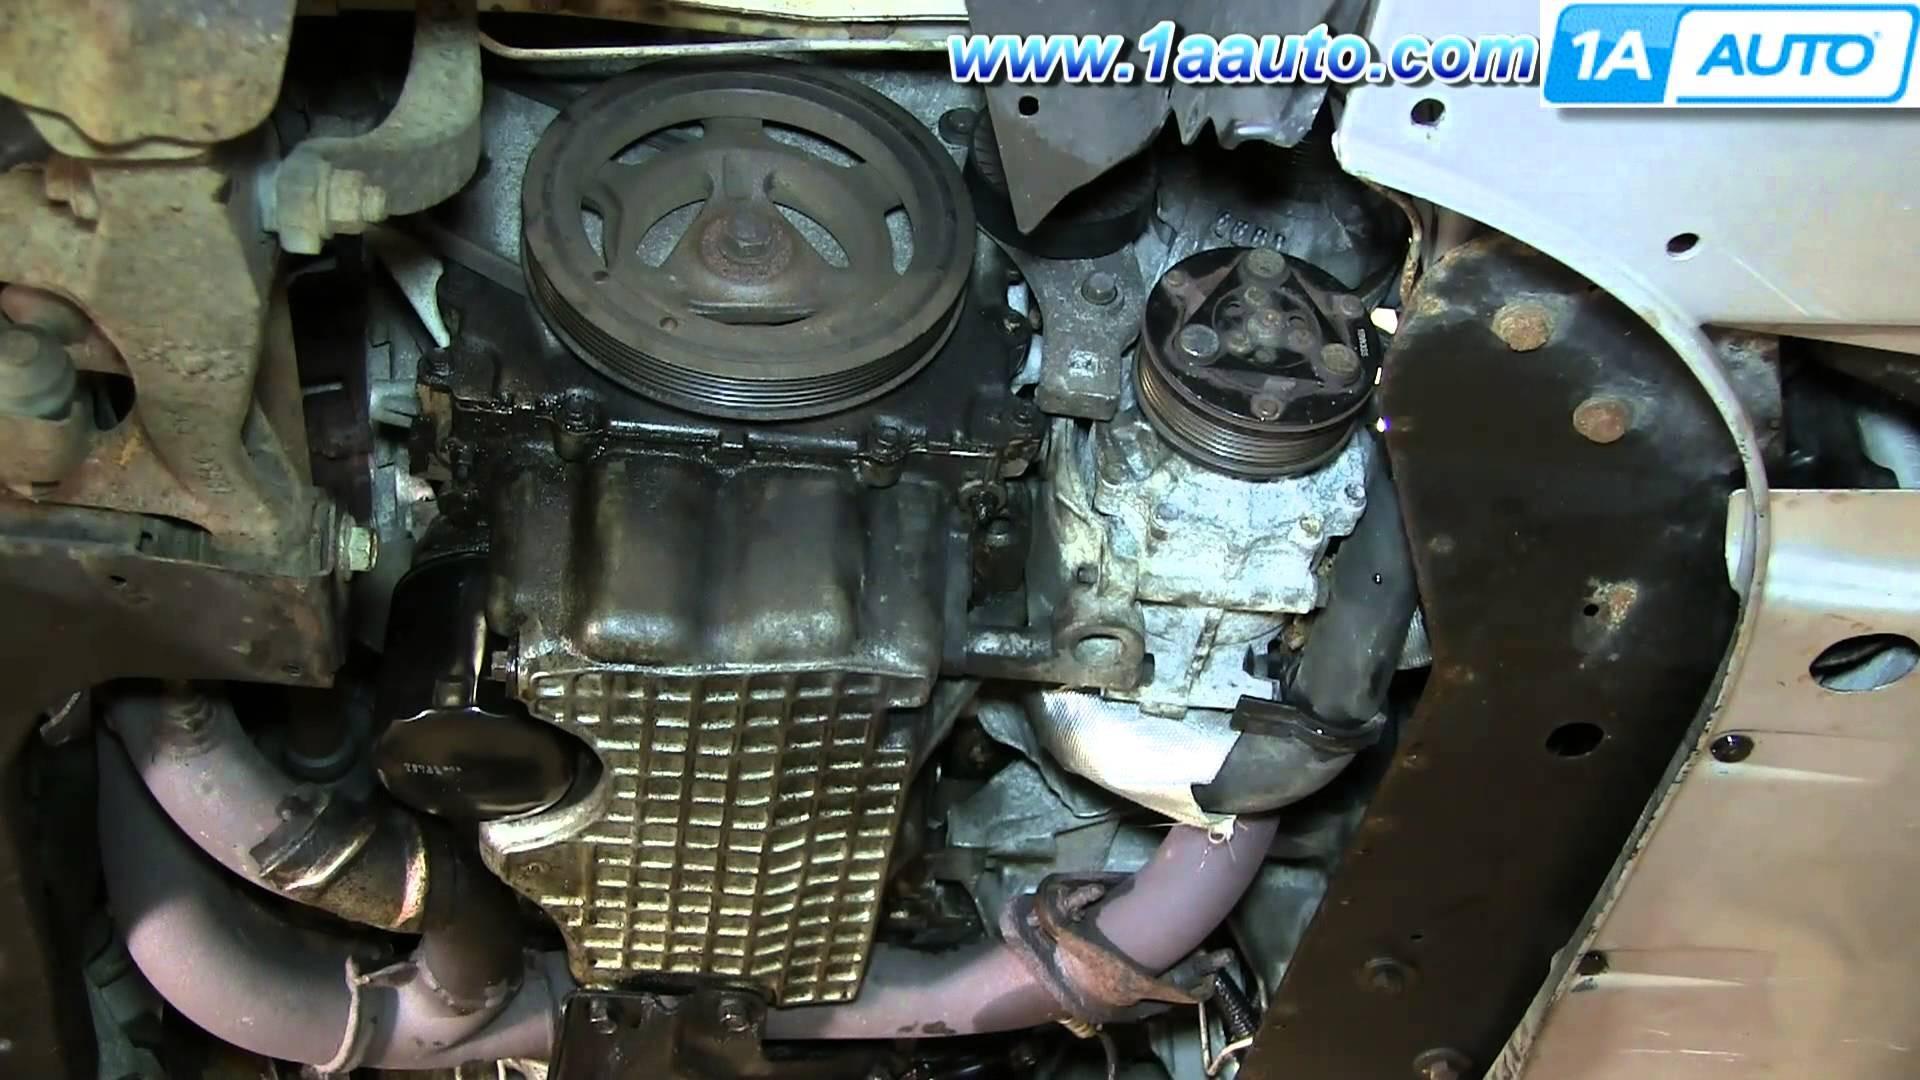 2005 Dodge Stratus Engine Diagram How to Install Replace Engine Ac Alternator Serpentine Belt 2 7l Of 2005 Dodge Stratus Engine Diagram